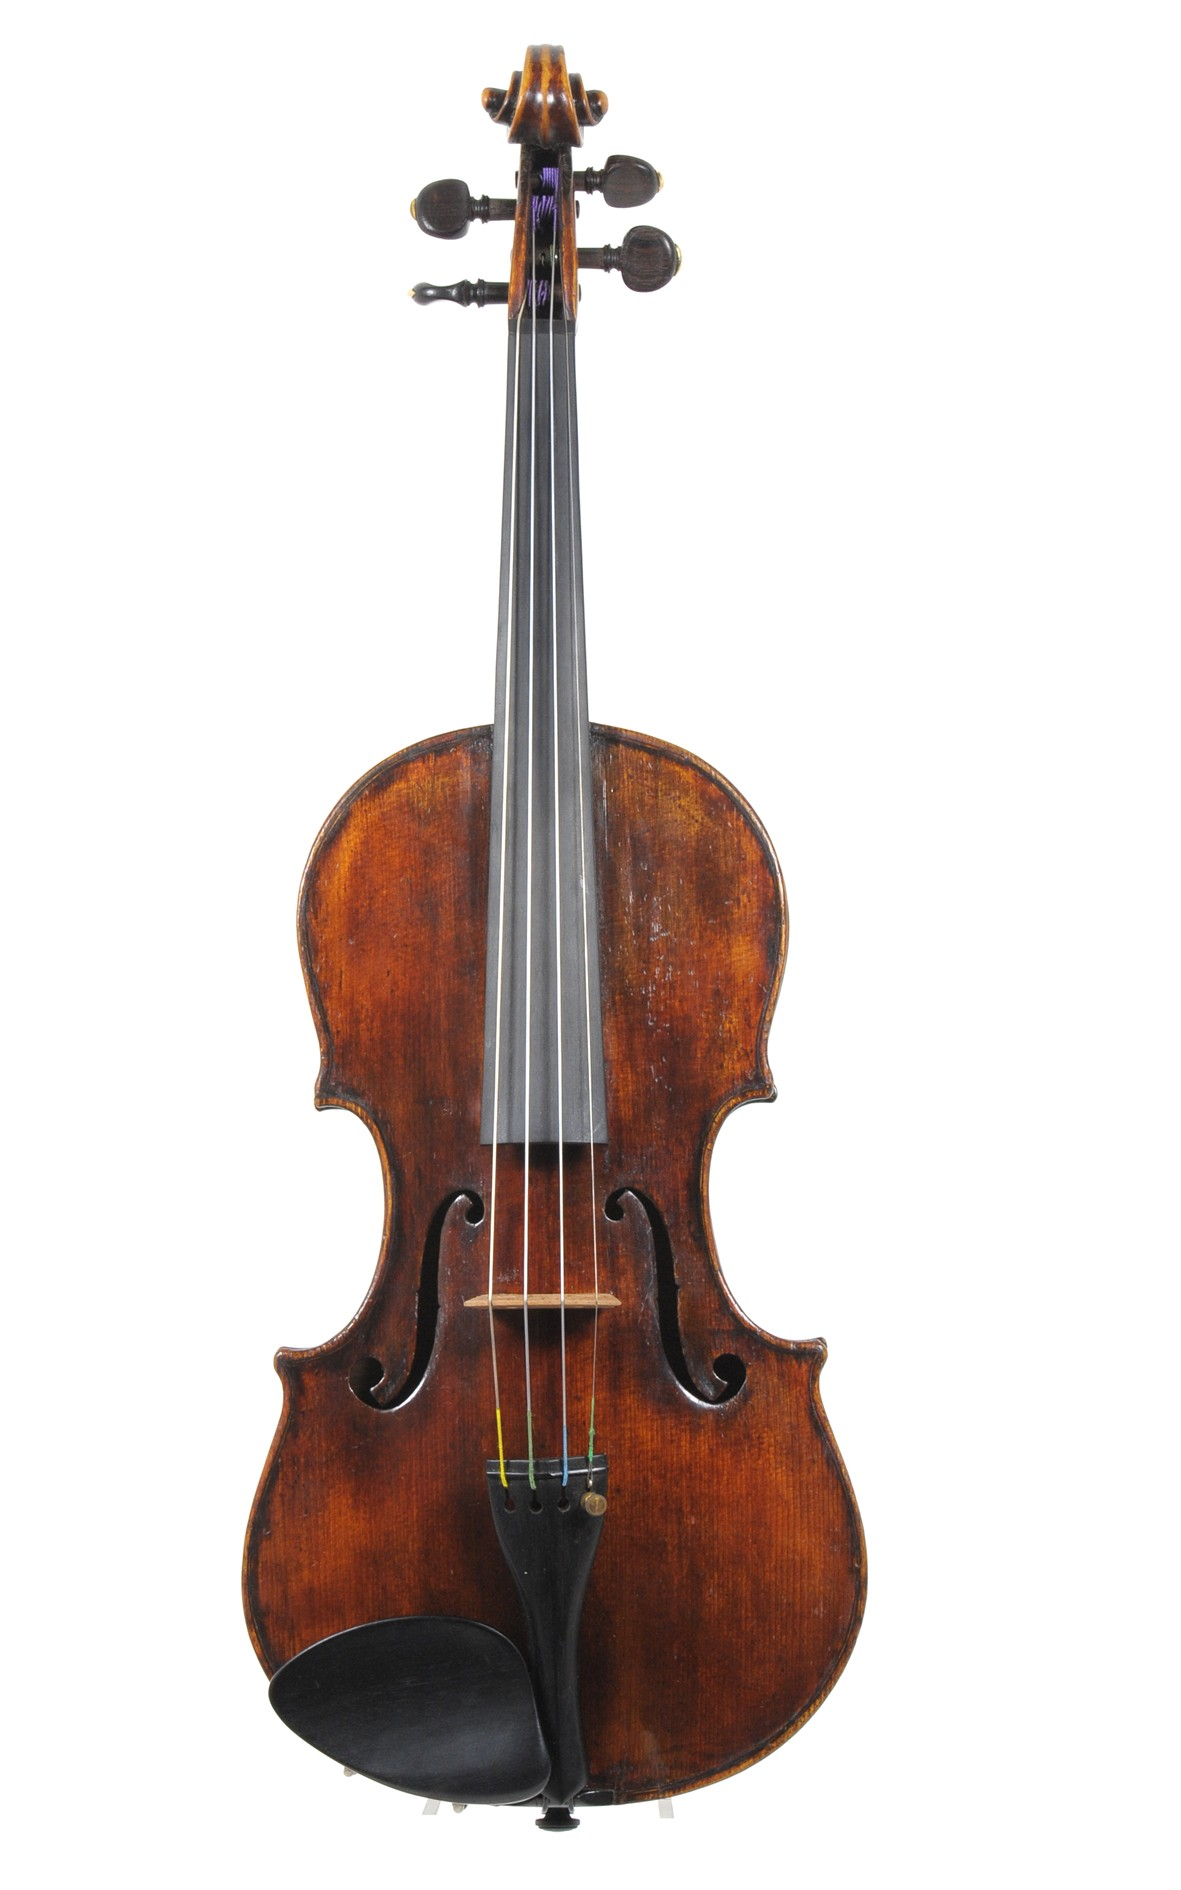 Fine Italian violin by Giuseppe Marconcini, Ferrara